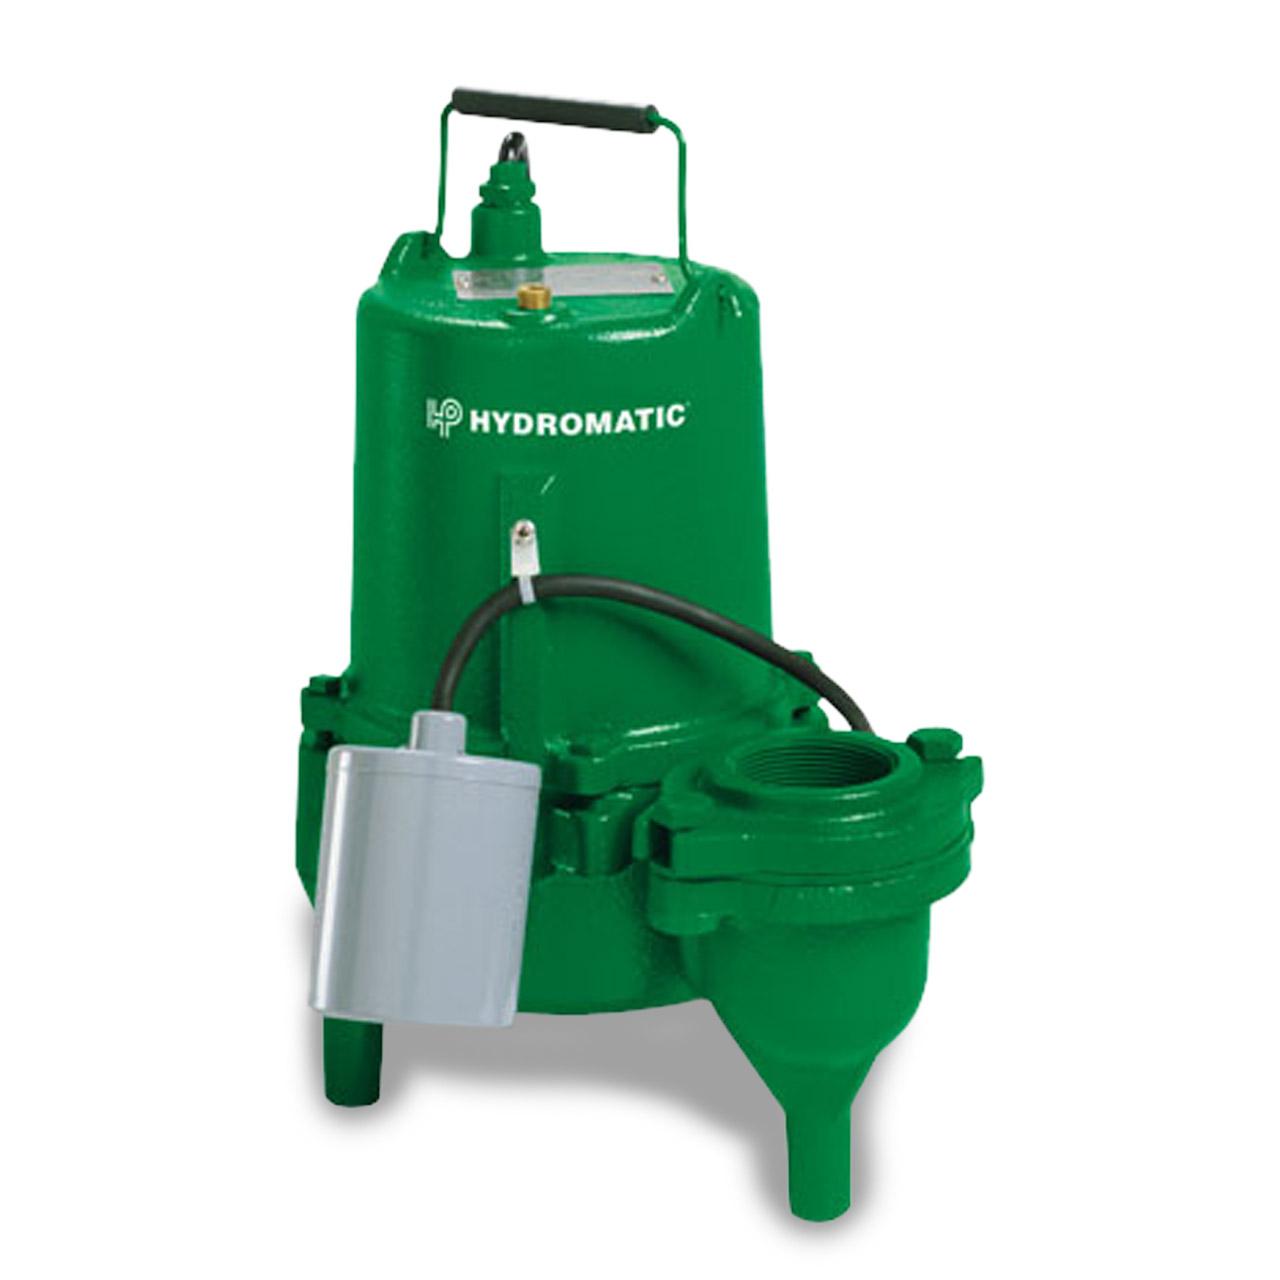 Hydromatic Pump - Hydromatic SK50A1 Submersible Sewage Pump 0.5 HP 115V 1PH  Automatic 10' Cord #HTC516540107